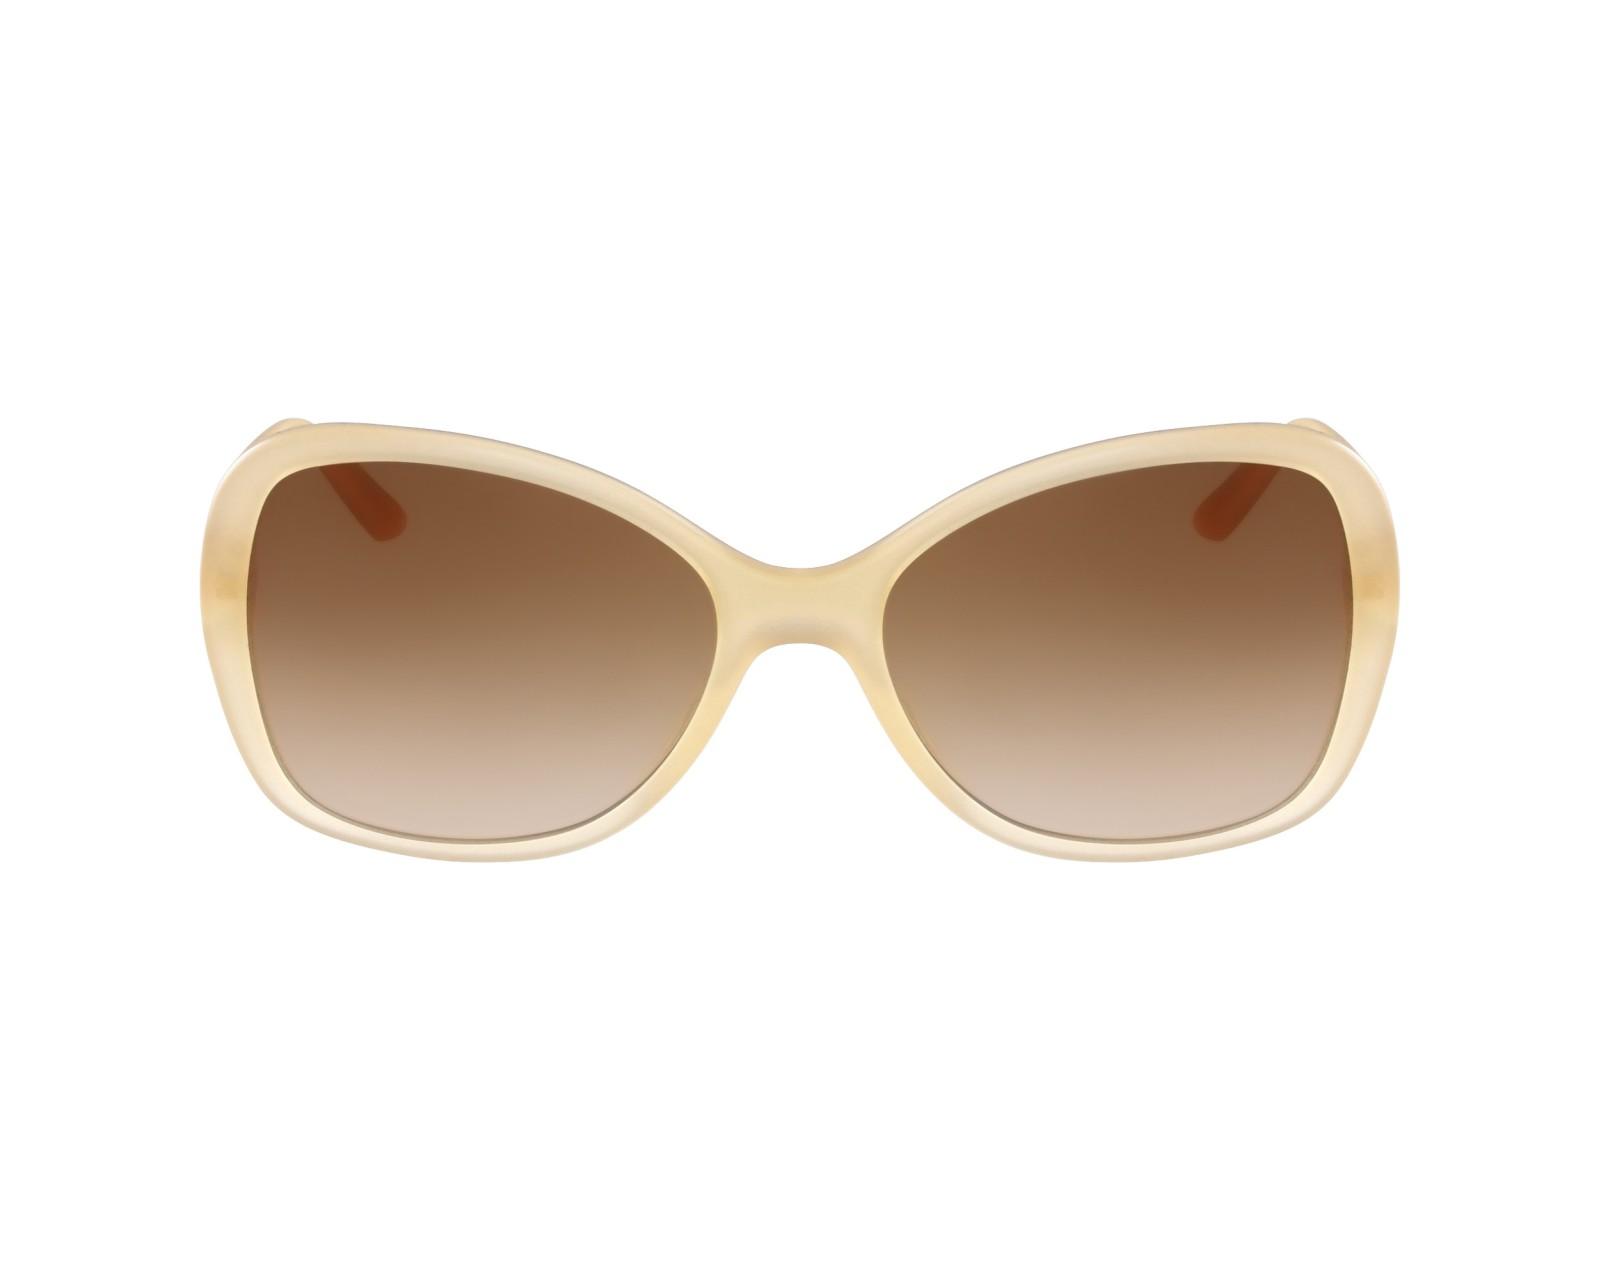 01eeb06d6a84f Sunglasses Versace VE-4271-B 503913 - Beige profile view